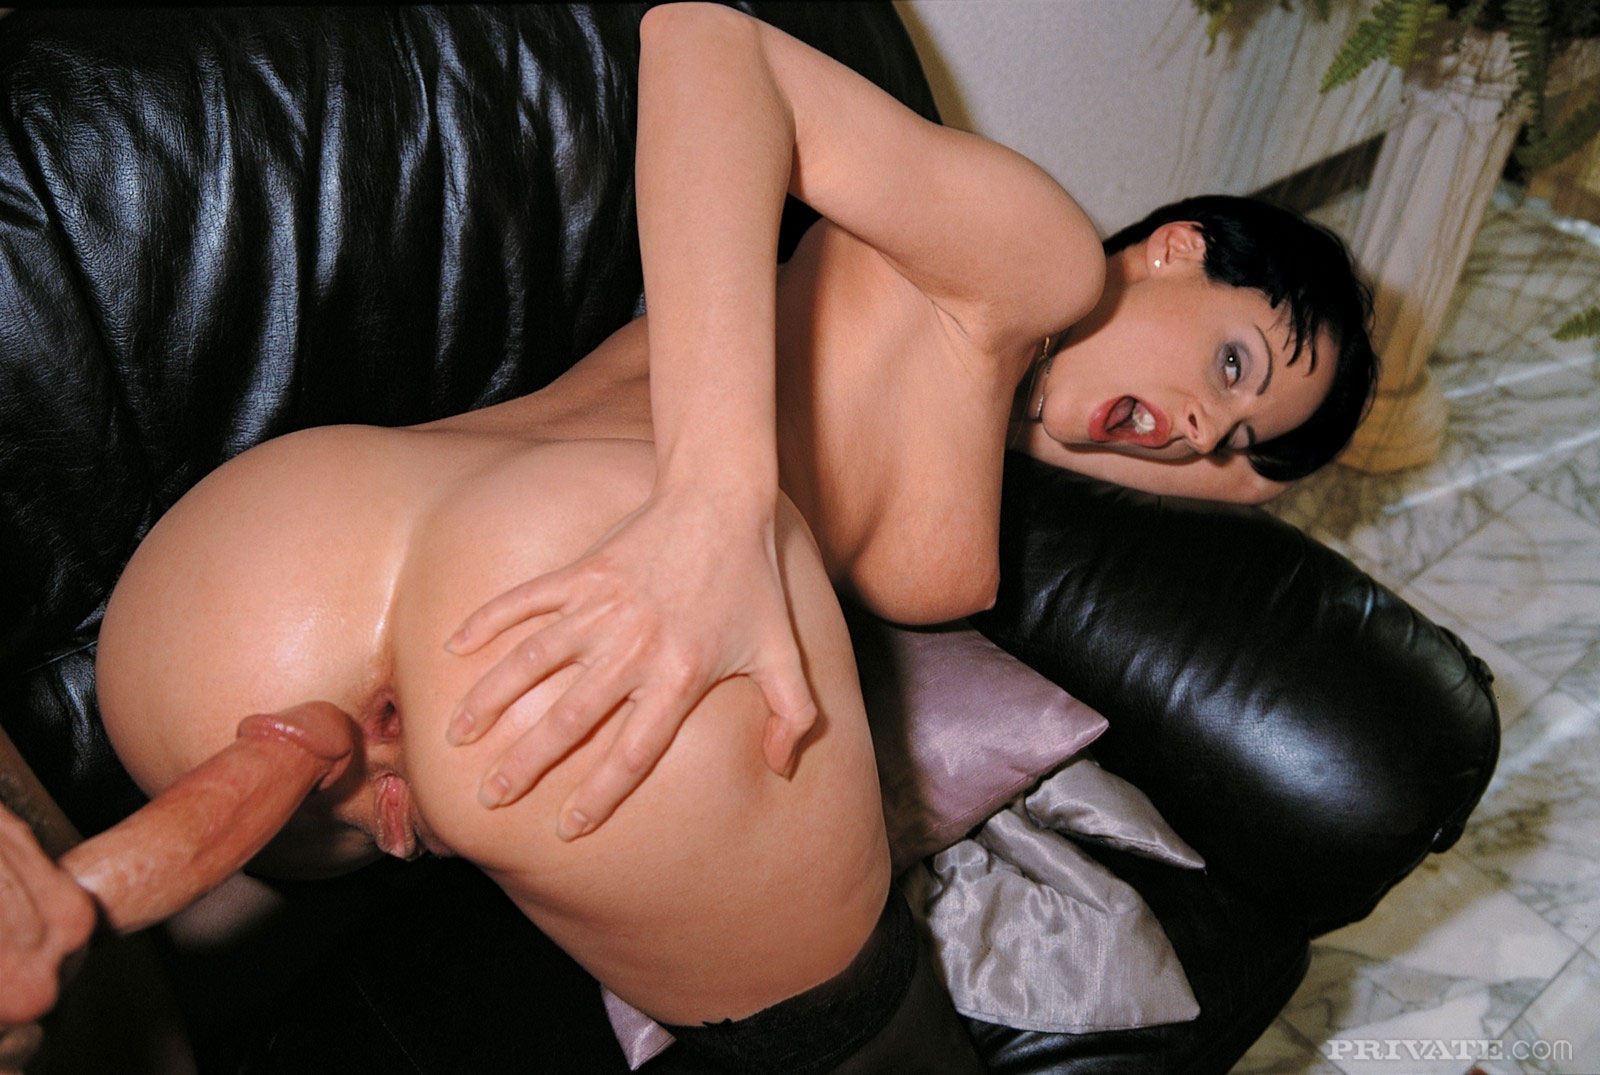 Серенити уайлд порно 23 фотография